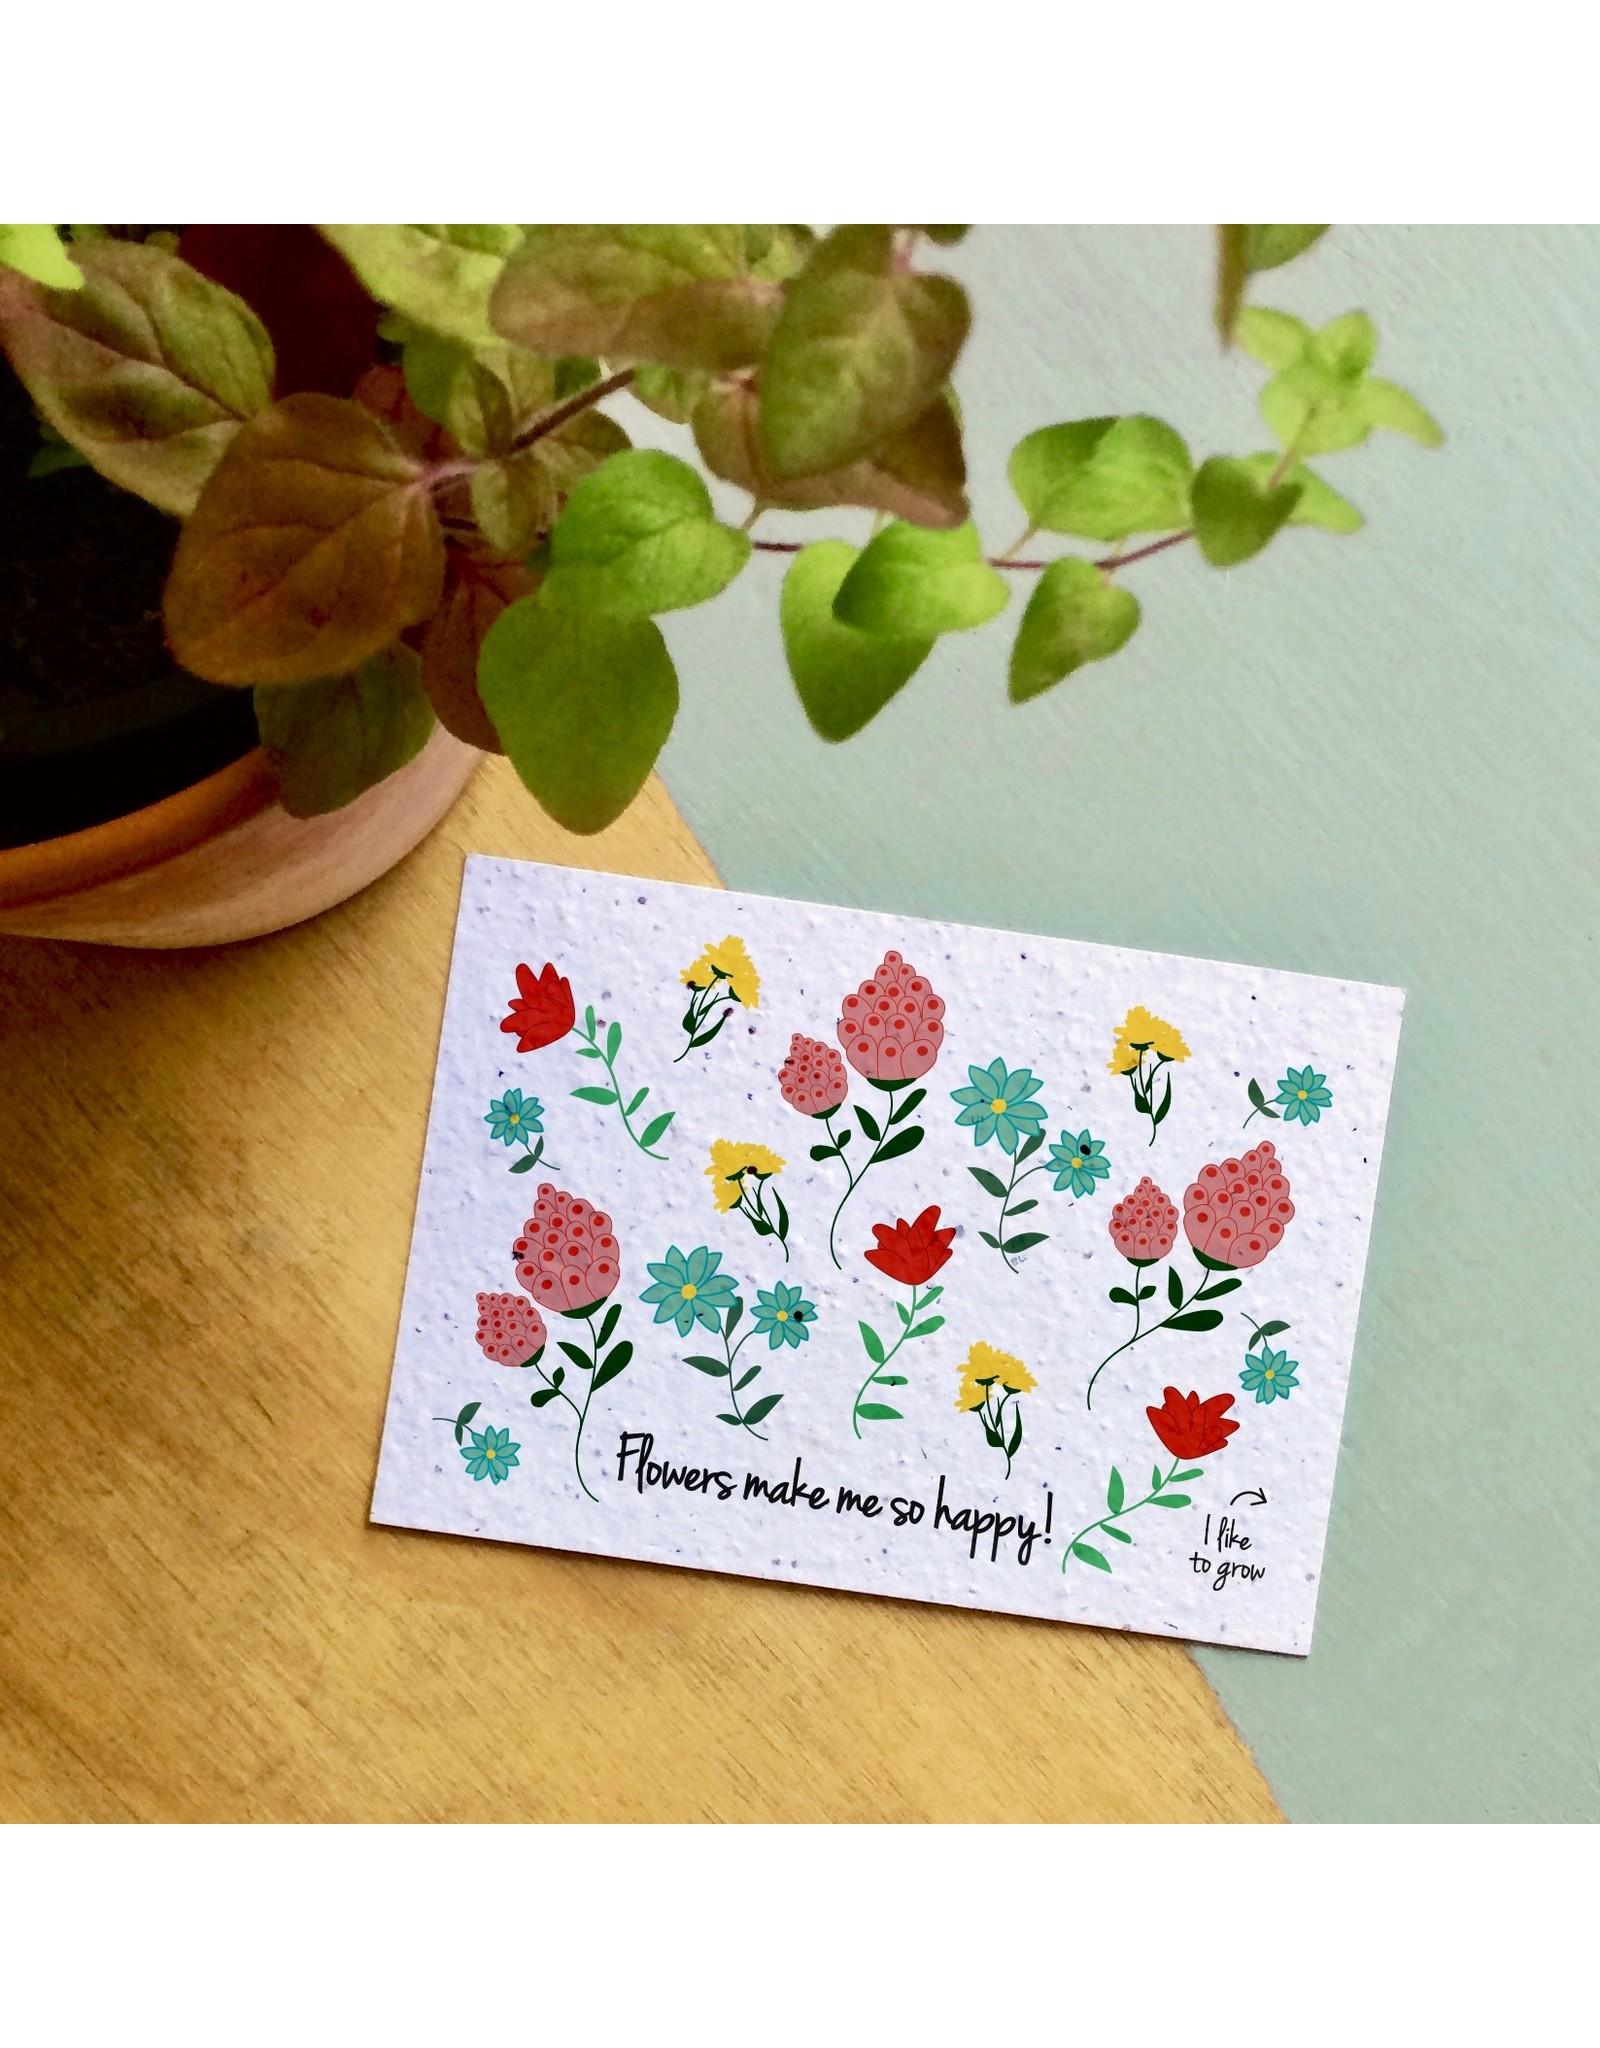 Bloom Bloom Card Flowers Make me Happy with Flower Seeds